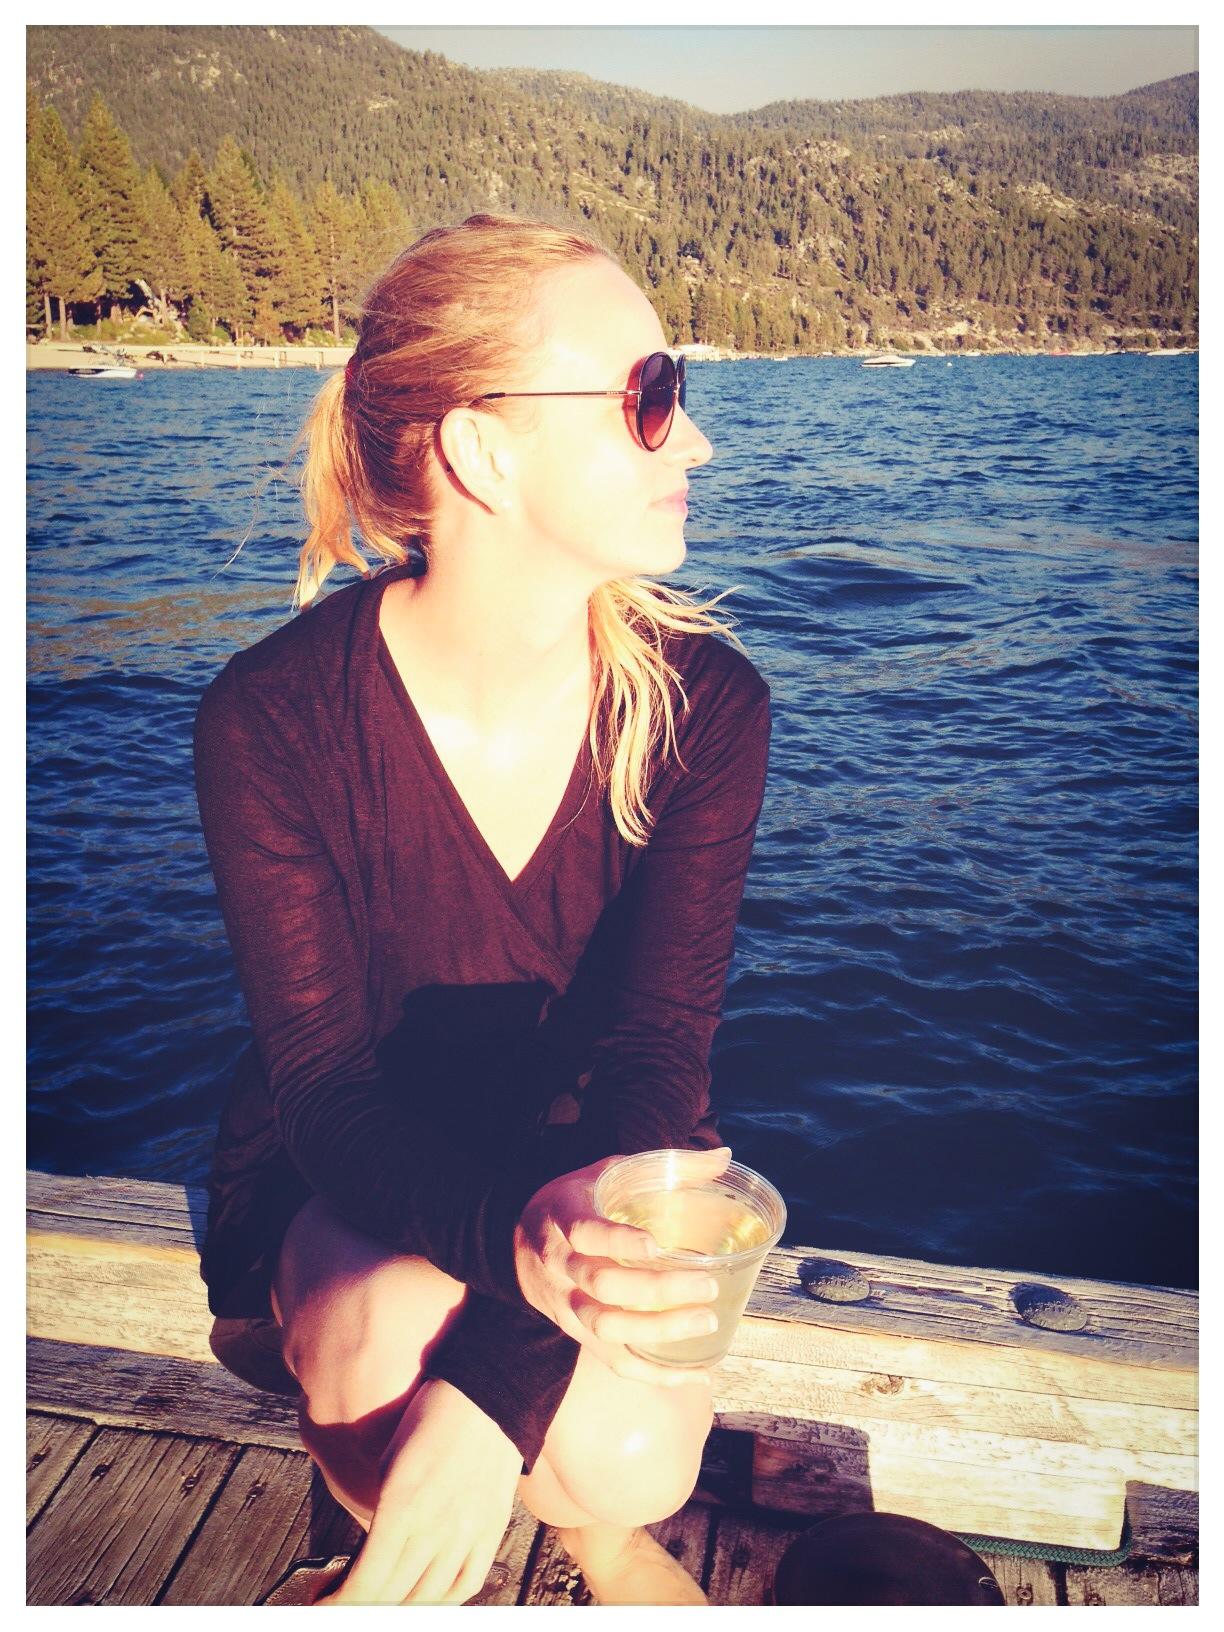 Hyatt Lake Tahoe, Nikola enjoying the sunset